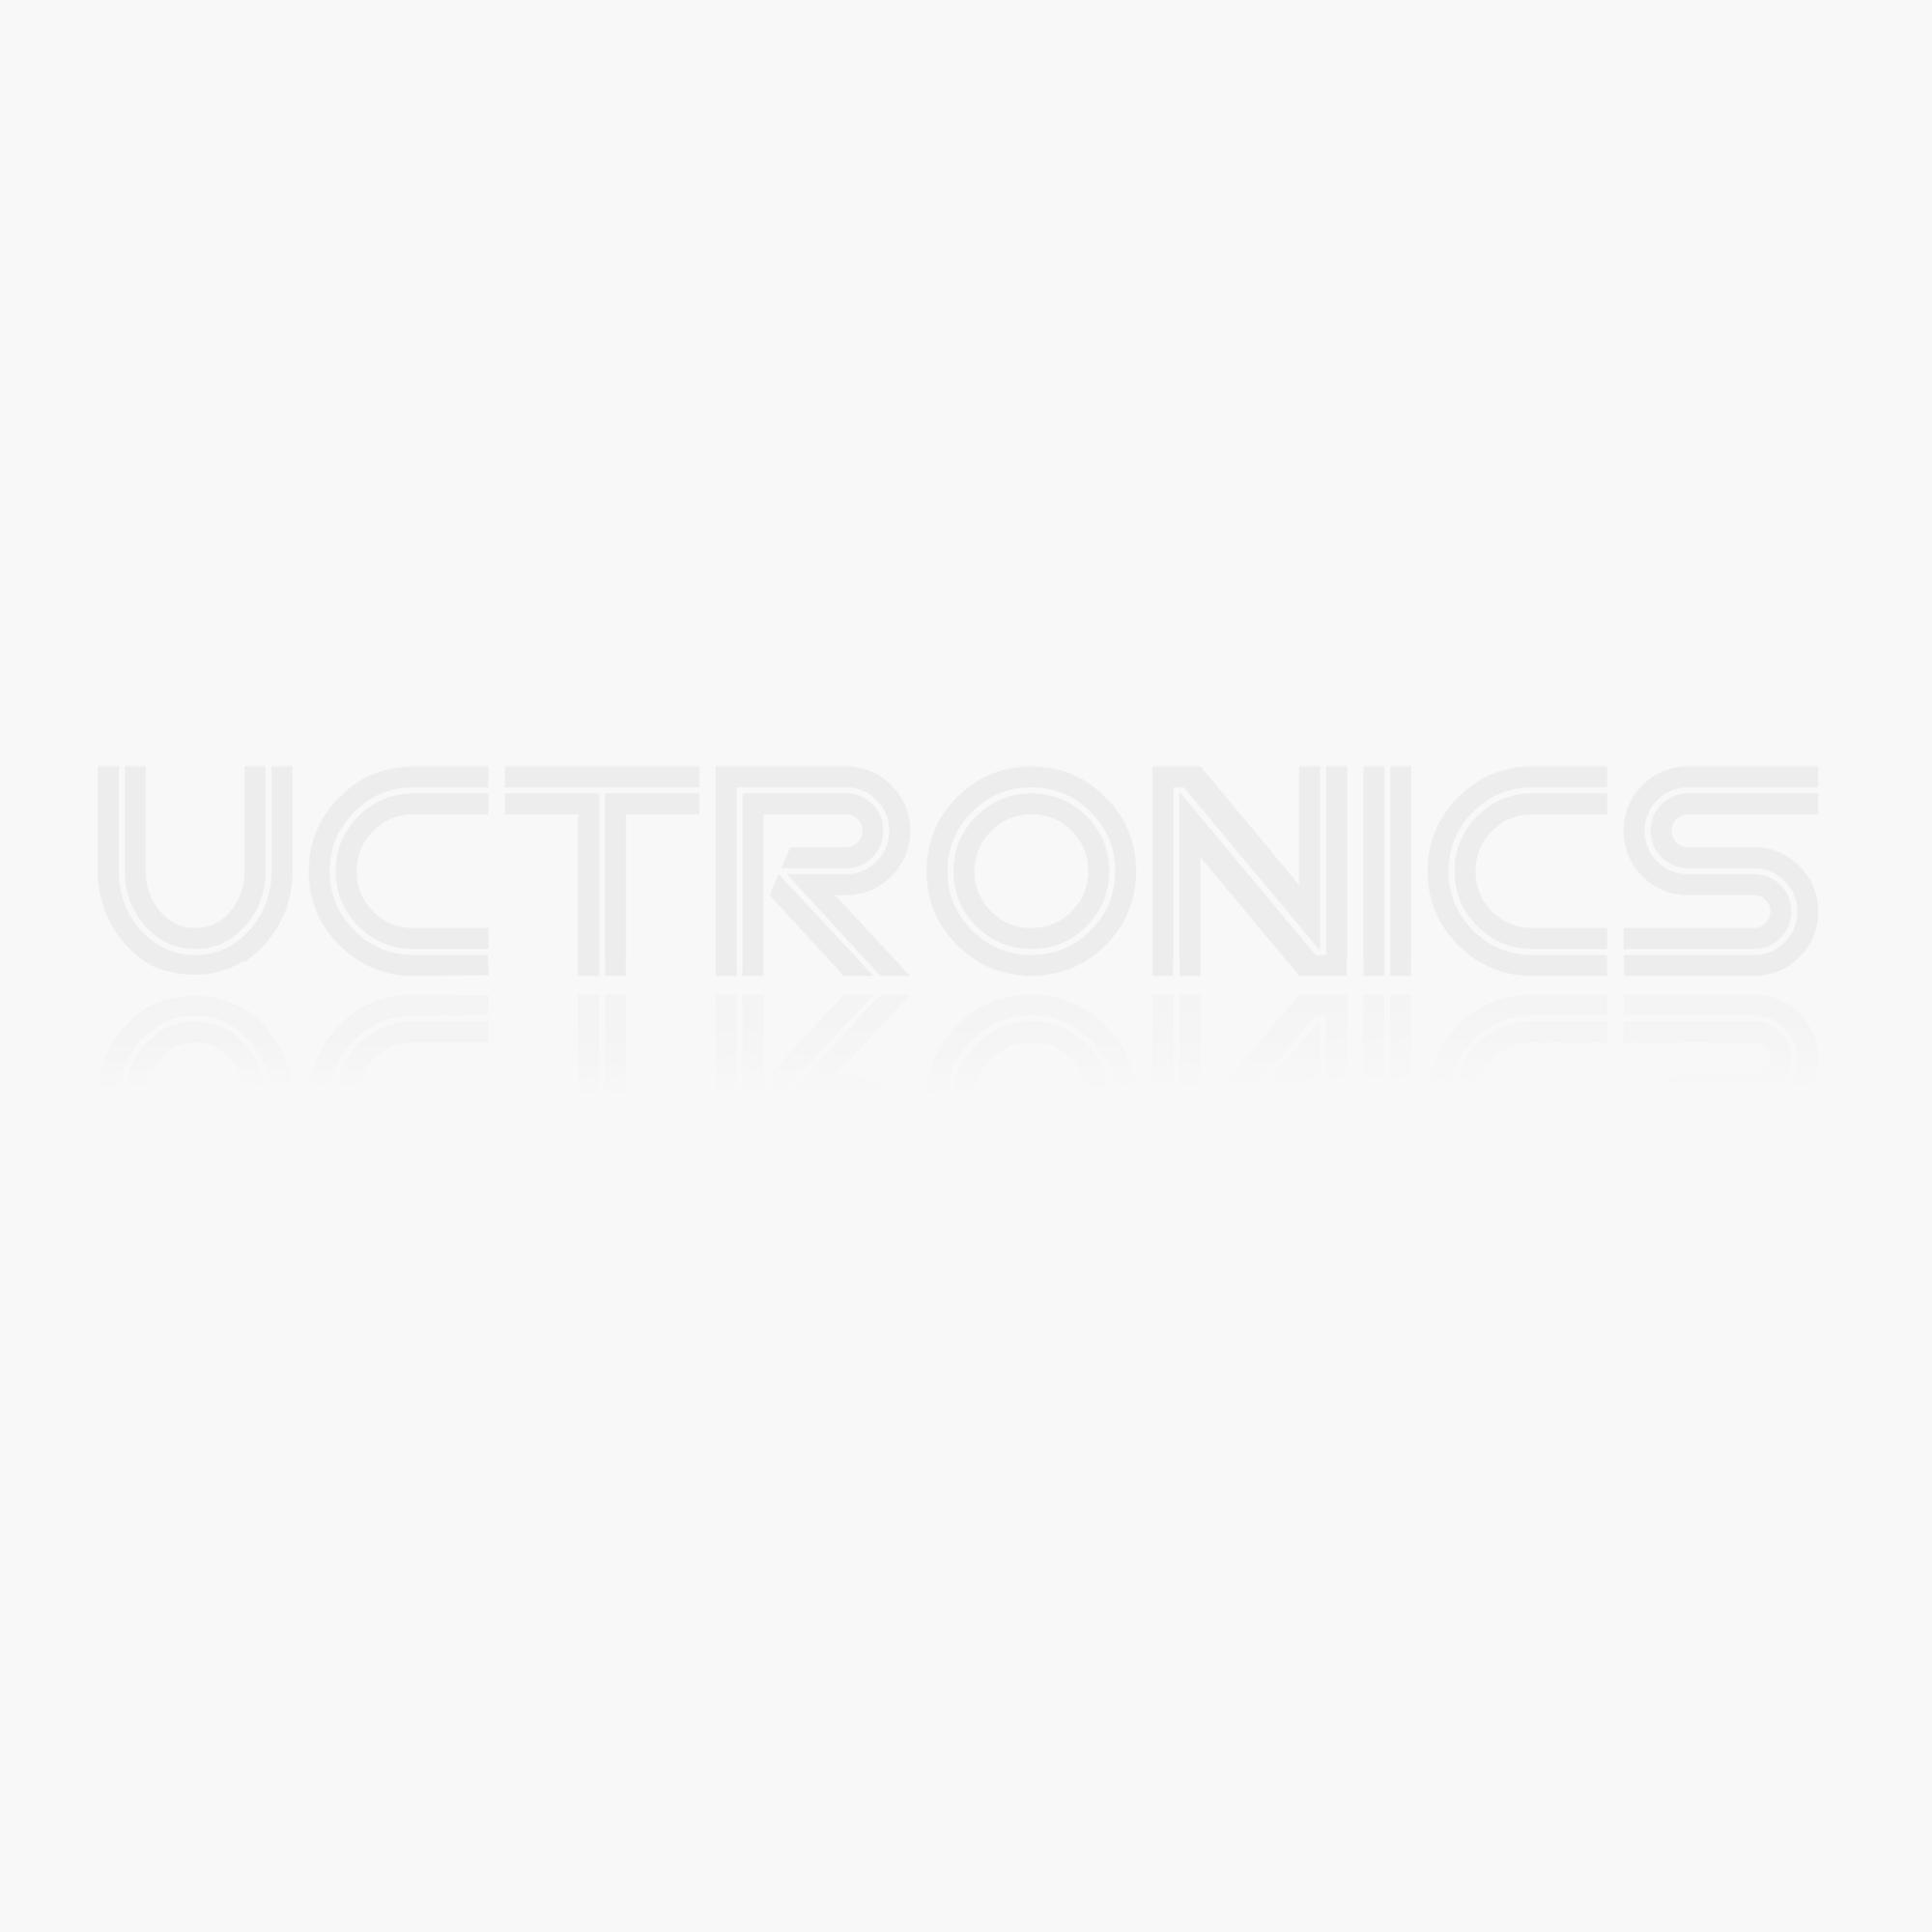 DC Converter Plug Female-Female Adapter Cable 5.5 * 2.1 20cm 3A Copper Wire